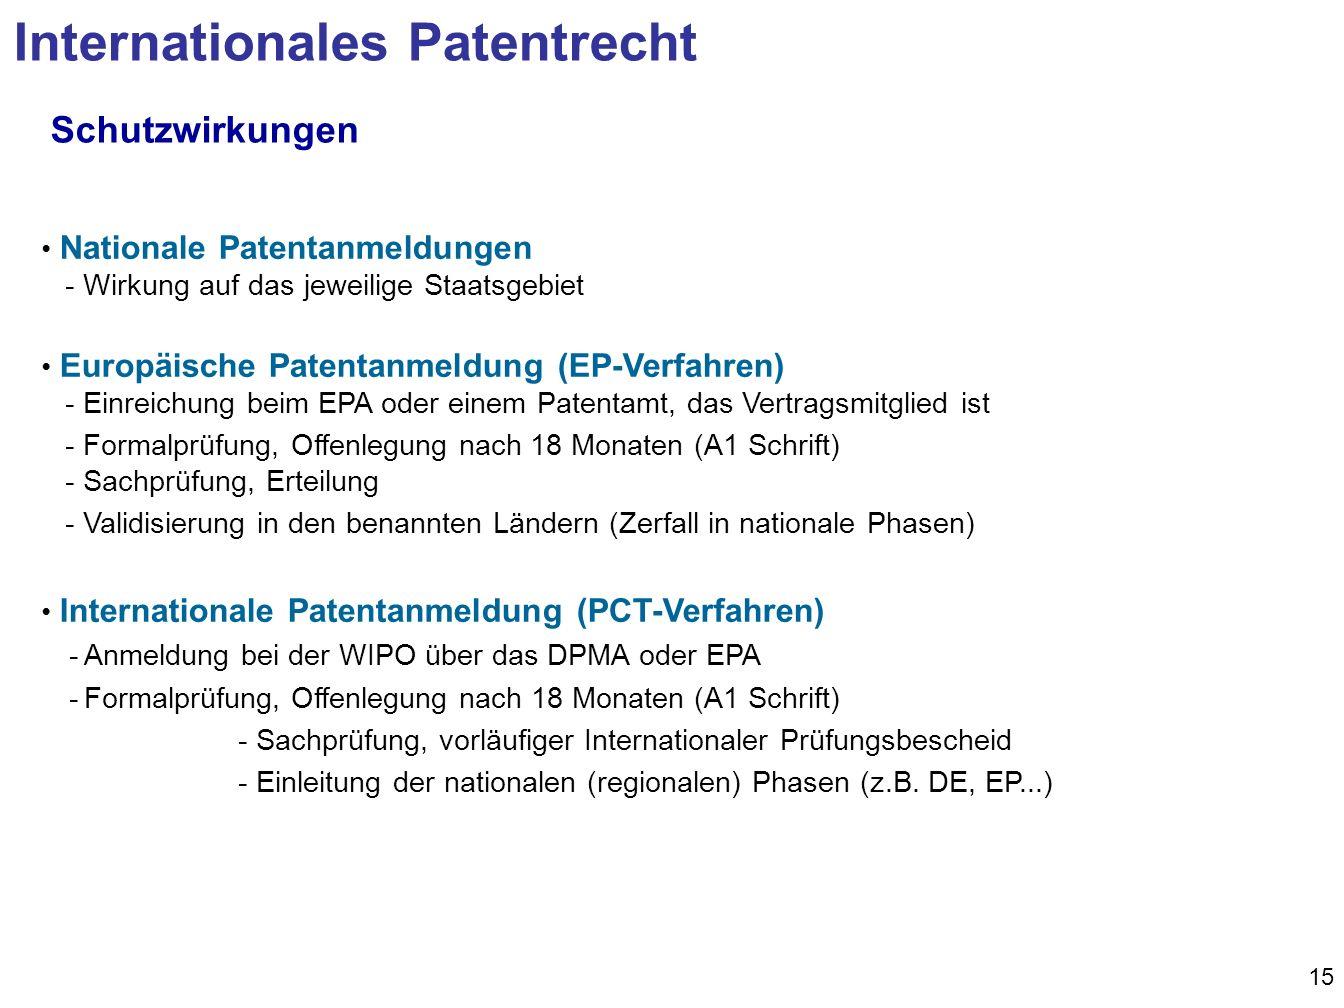 Internationales Patentrecht